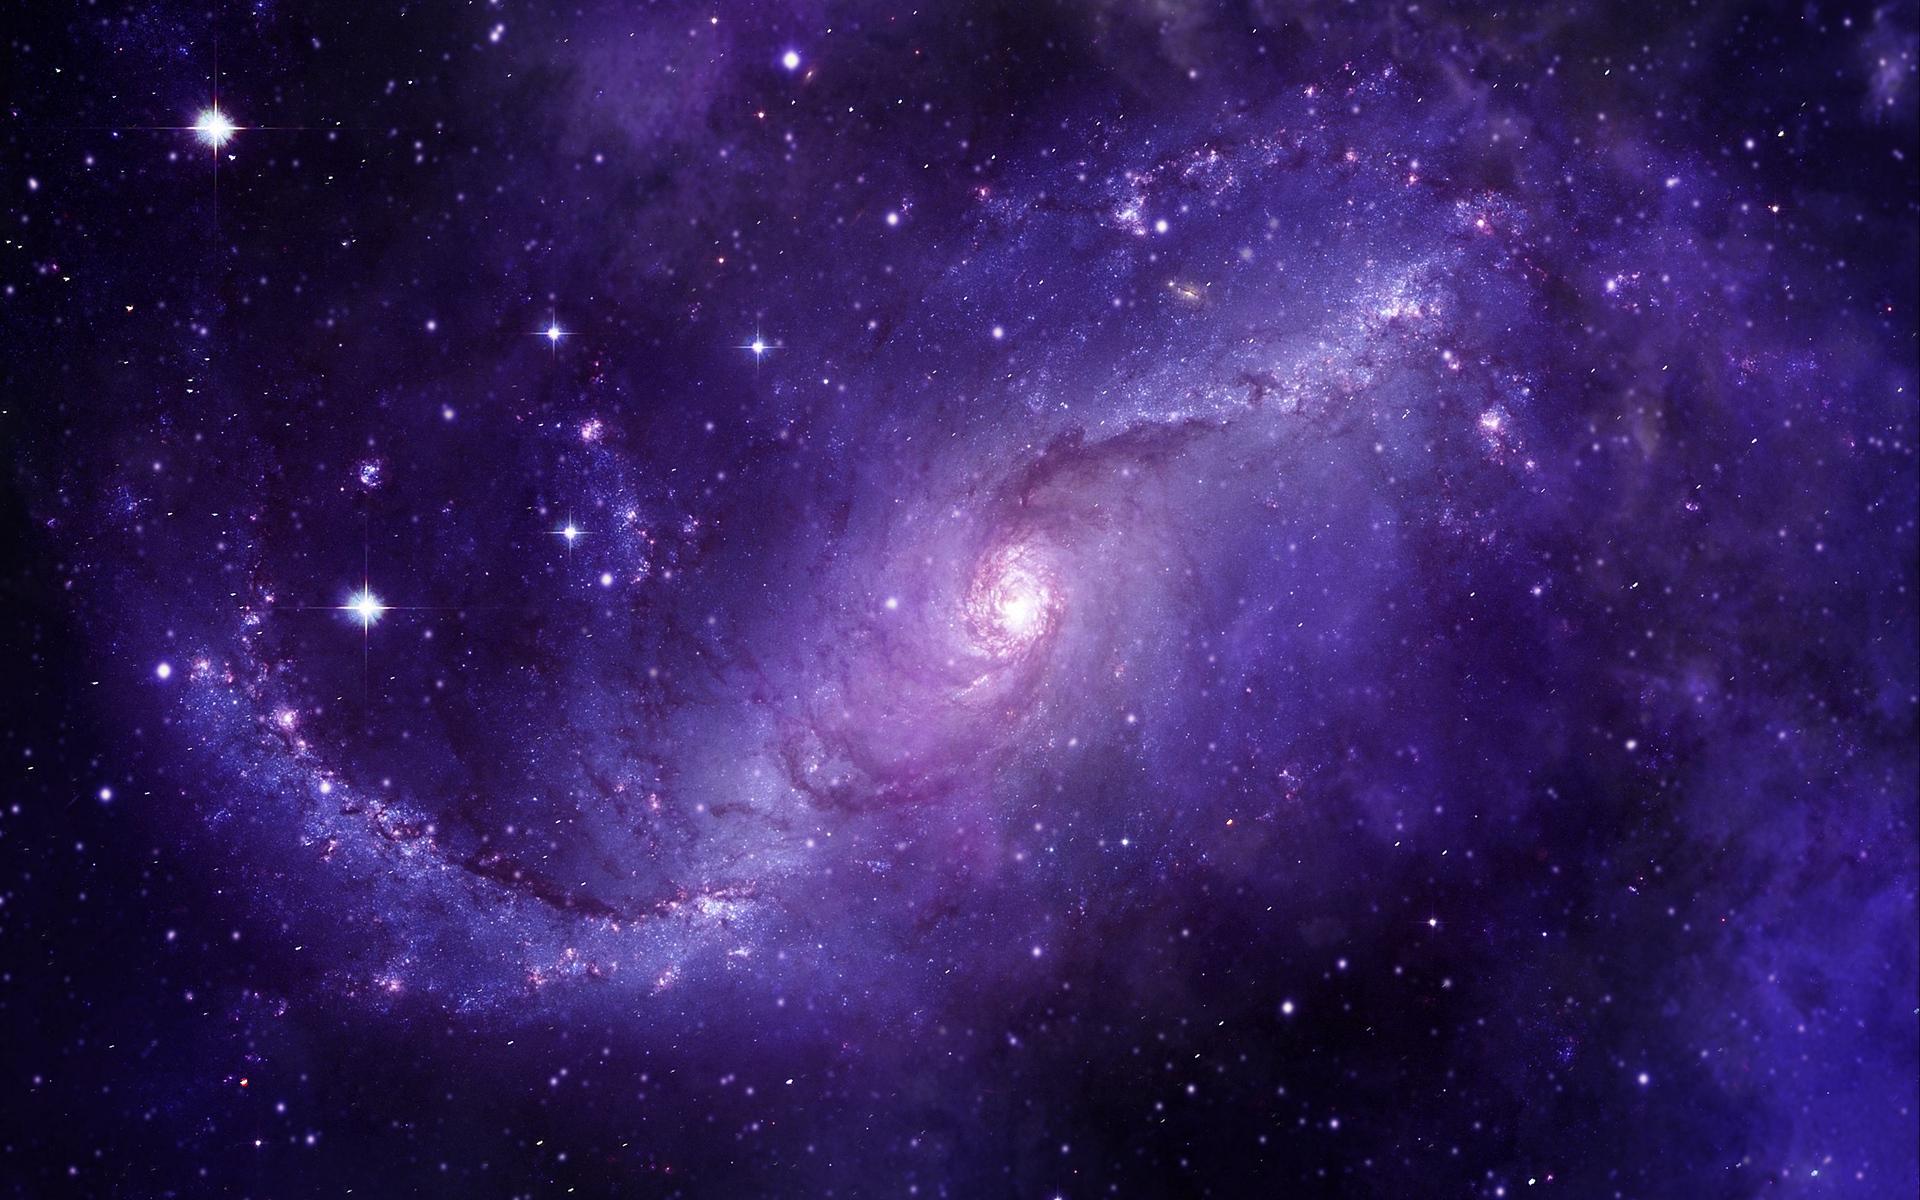 Purple space hd wallpaper background image 1920x1200 - Purple space wallpaper ...